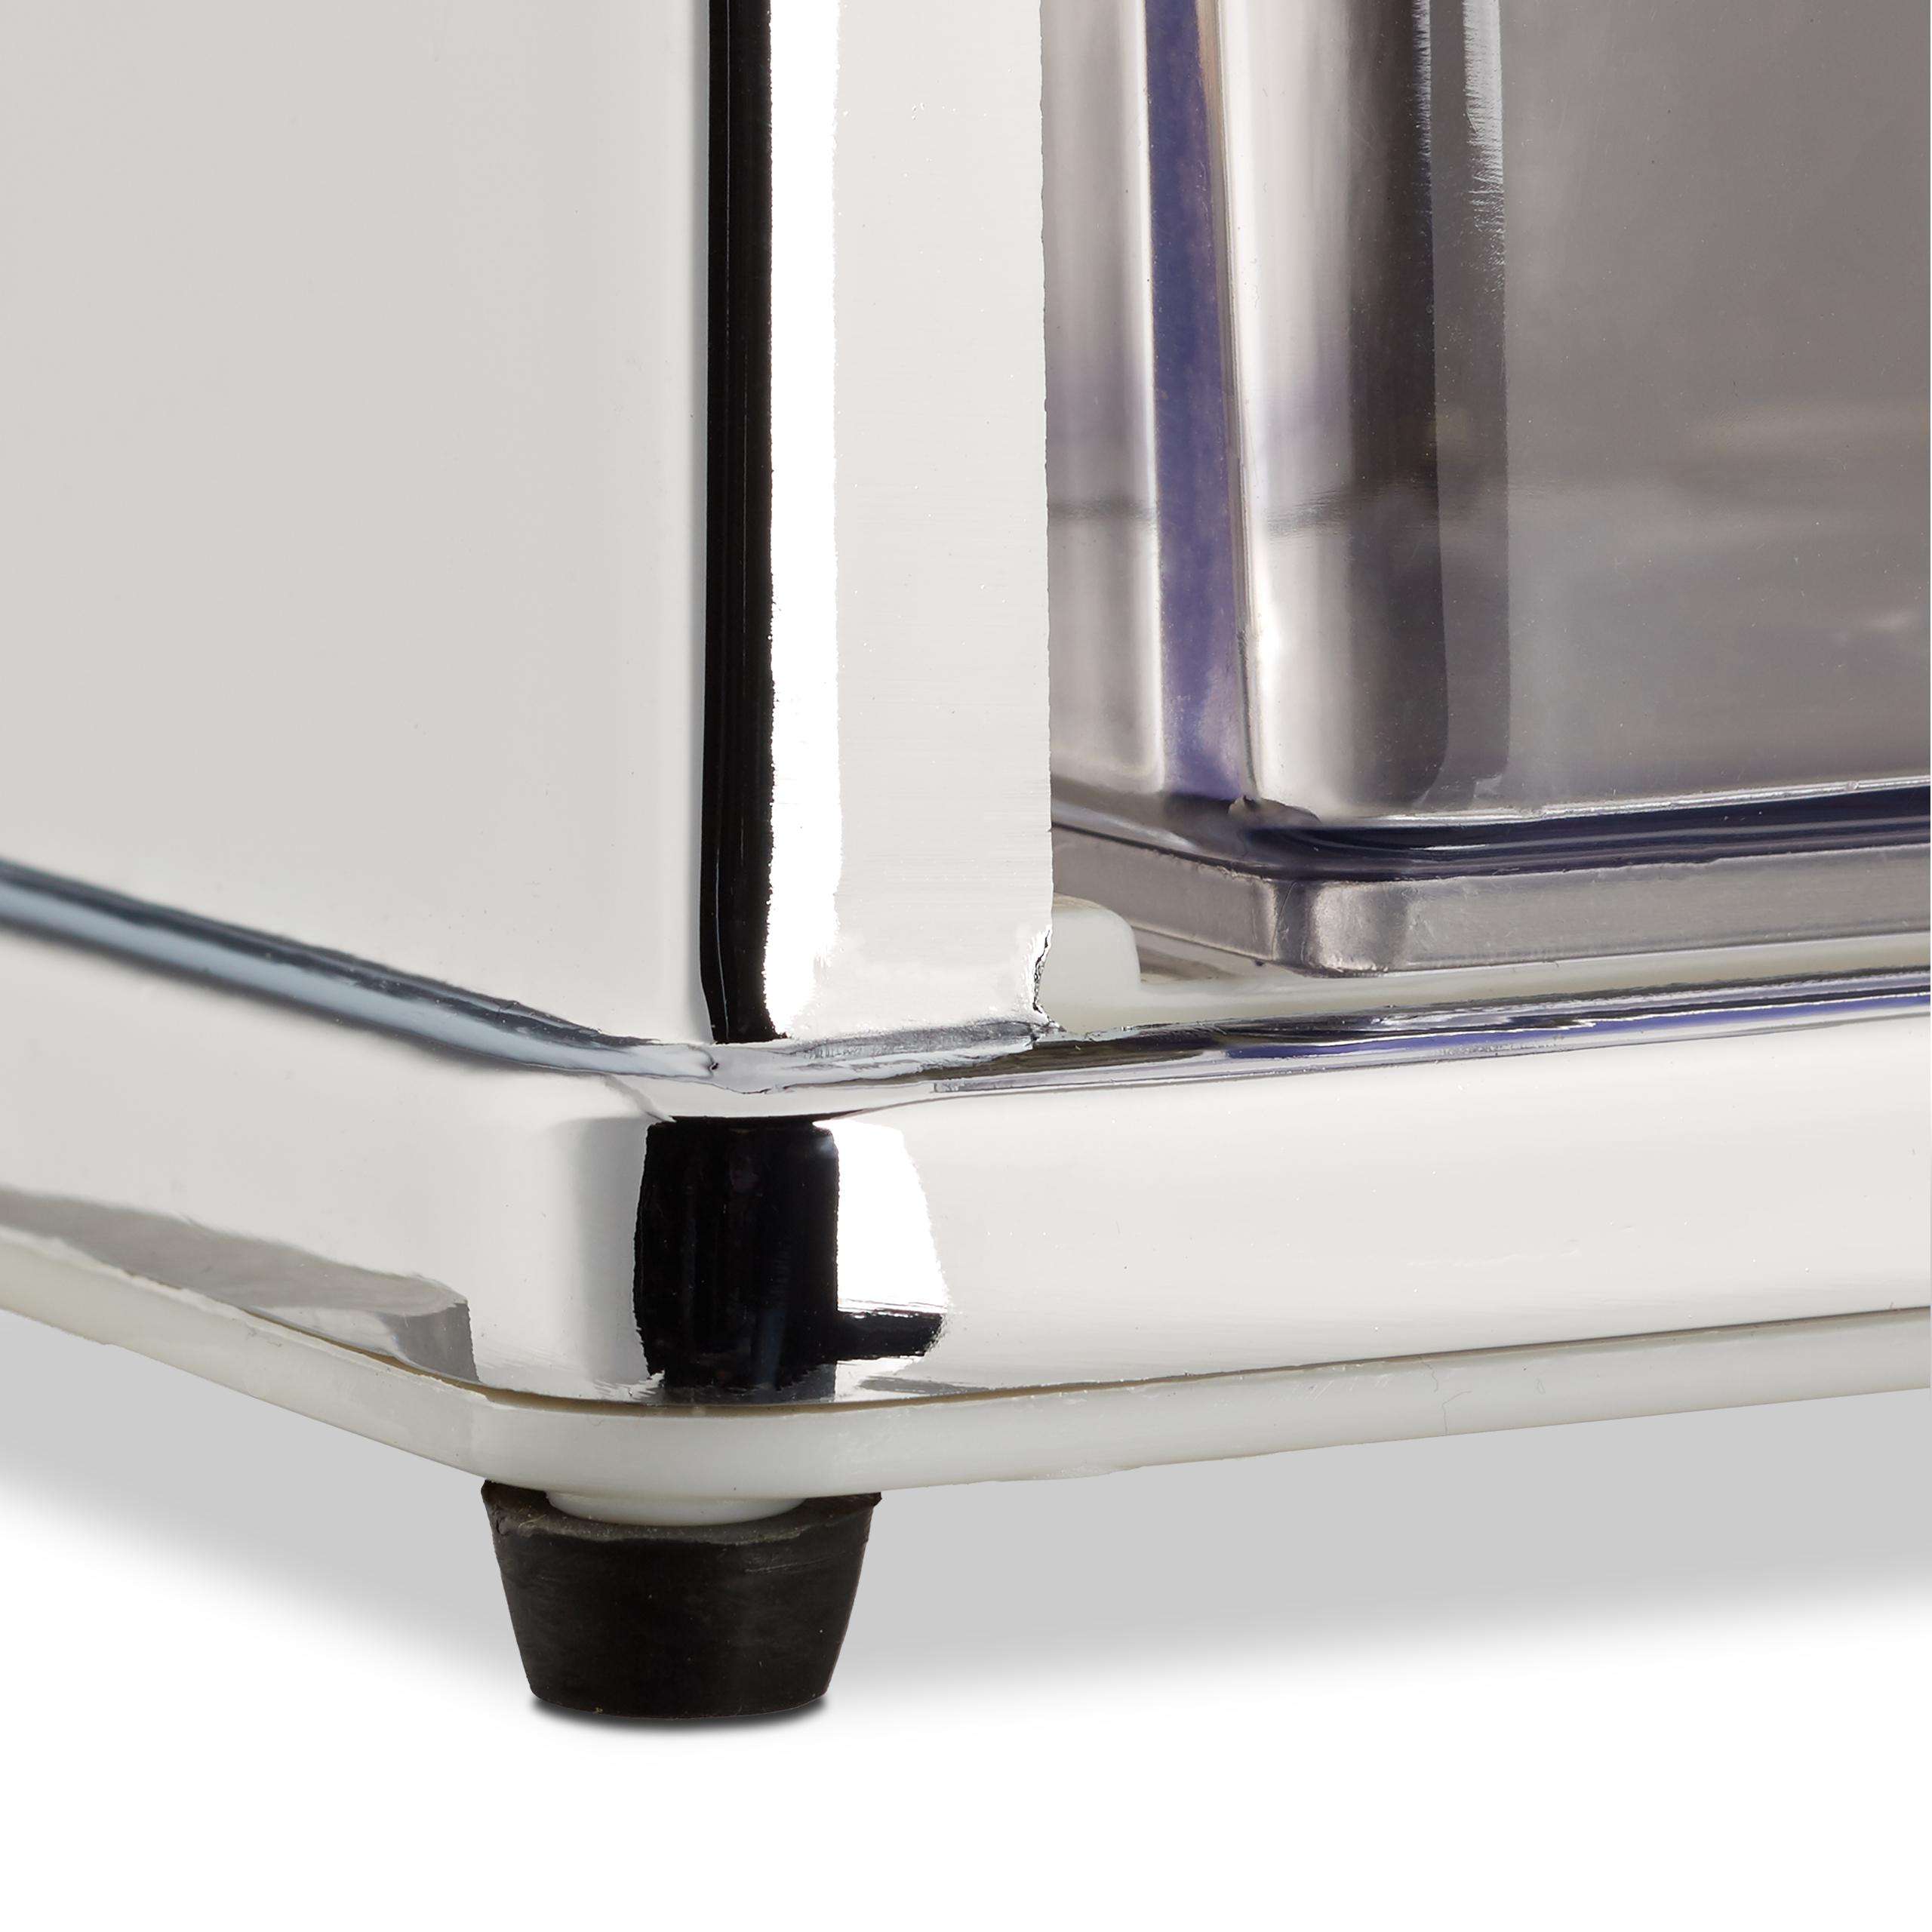 eiscrusher maschine manueller ice crusher metall. Black Bedroom Furniture Sets. Home Design Ideas